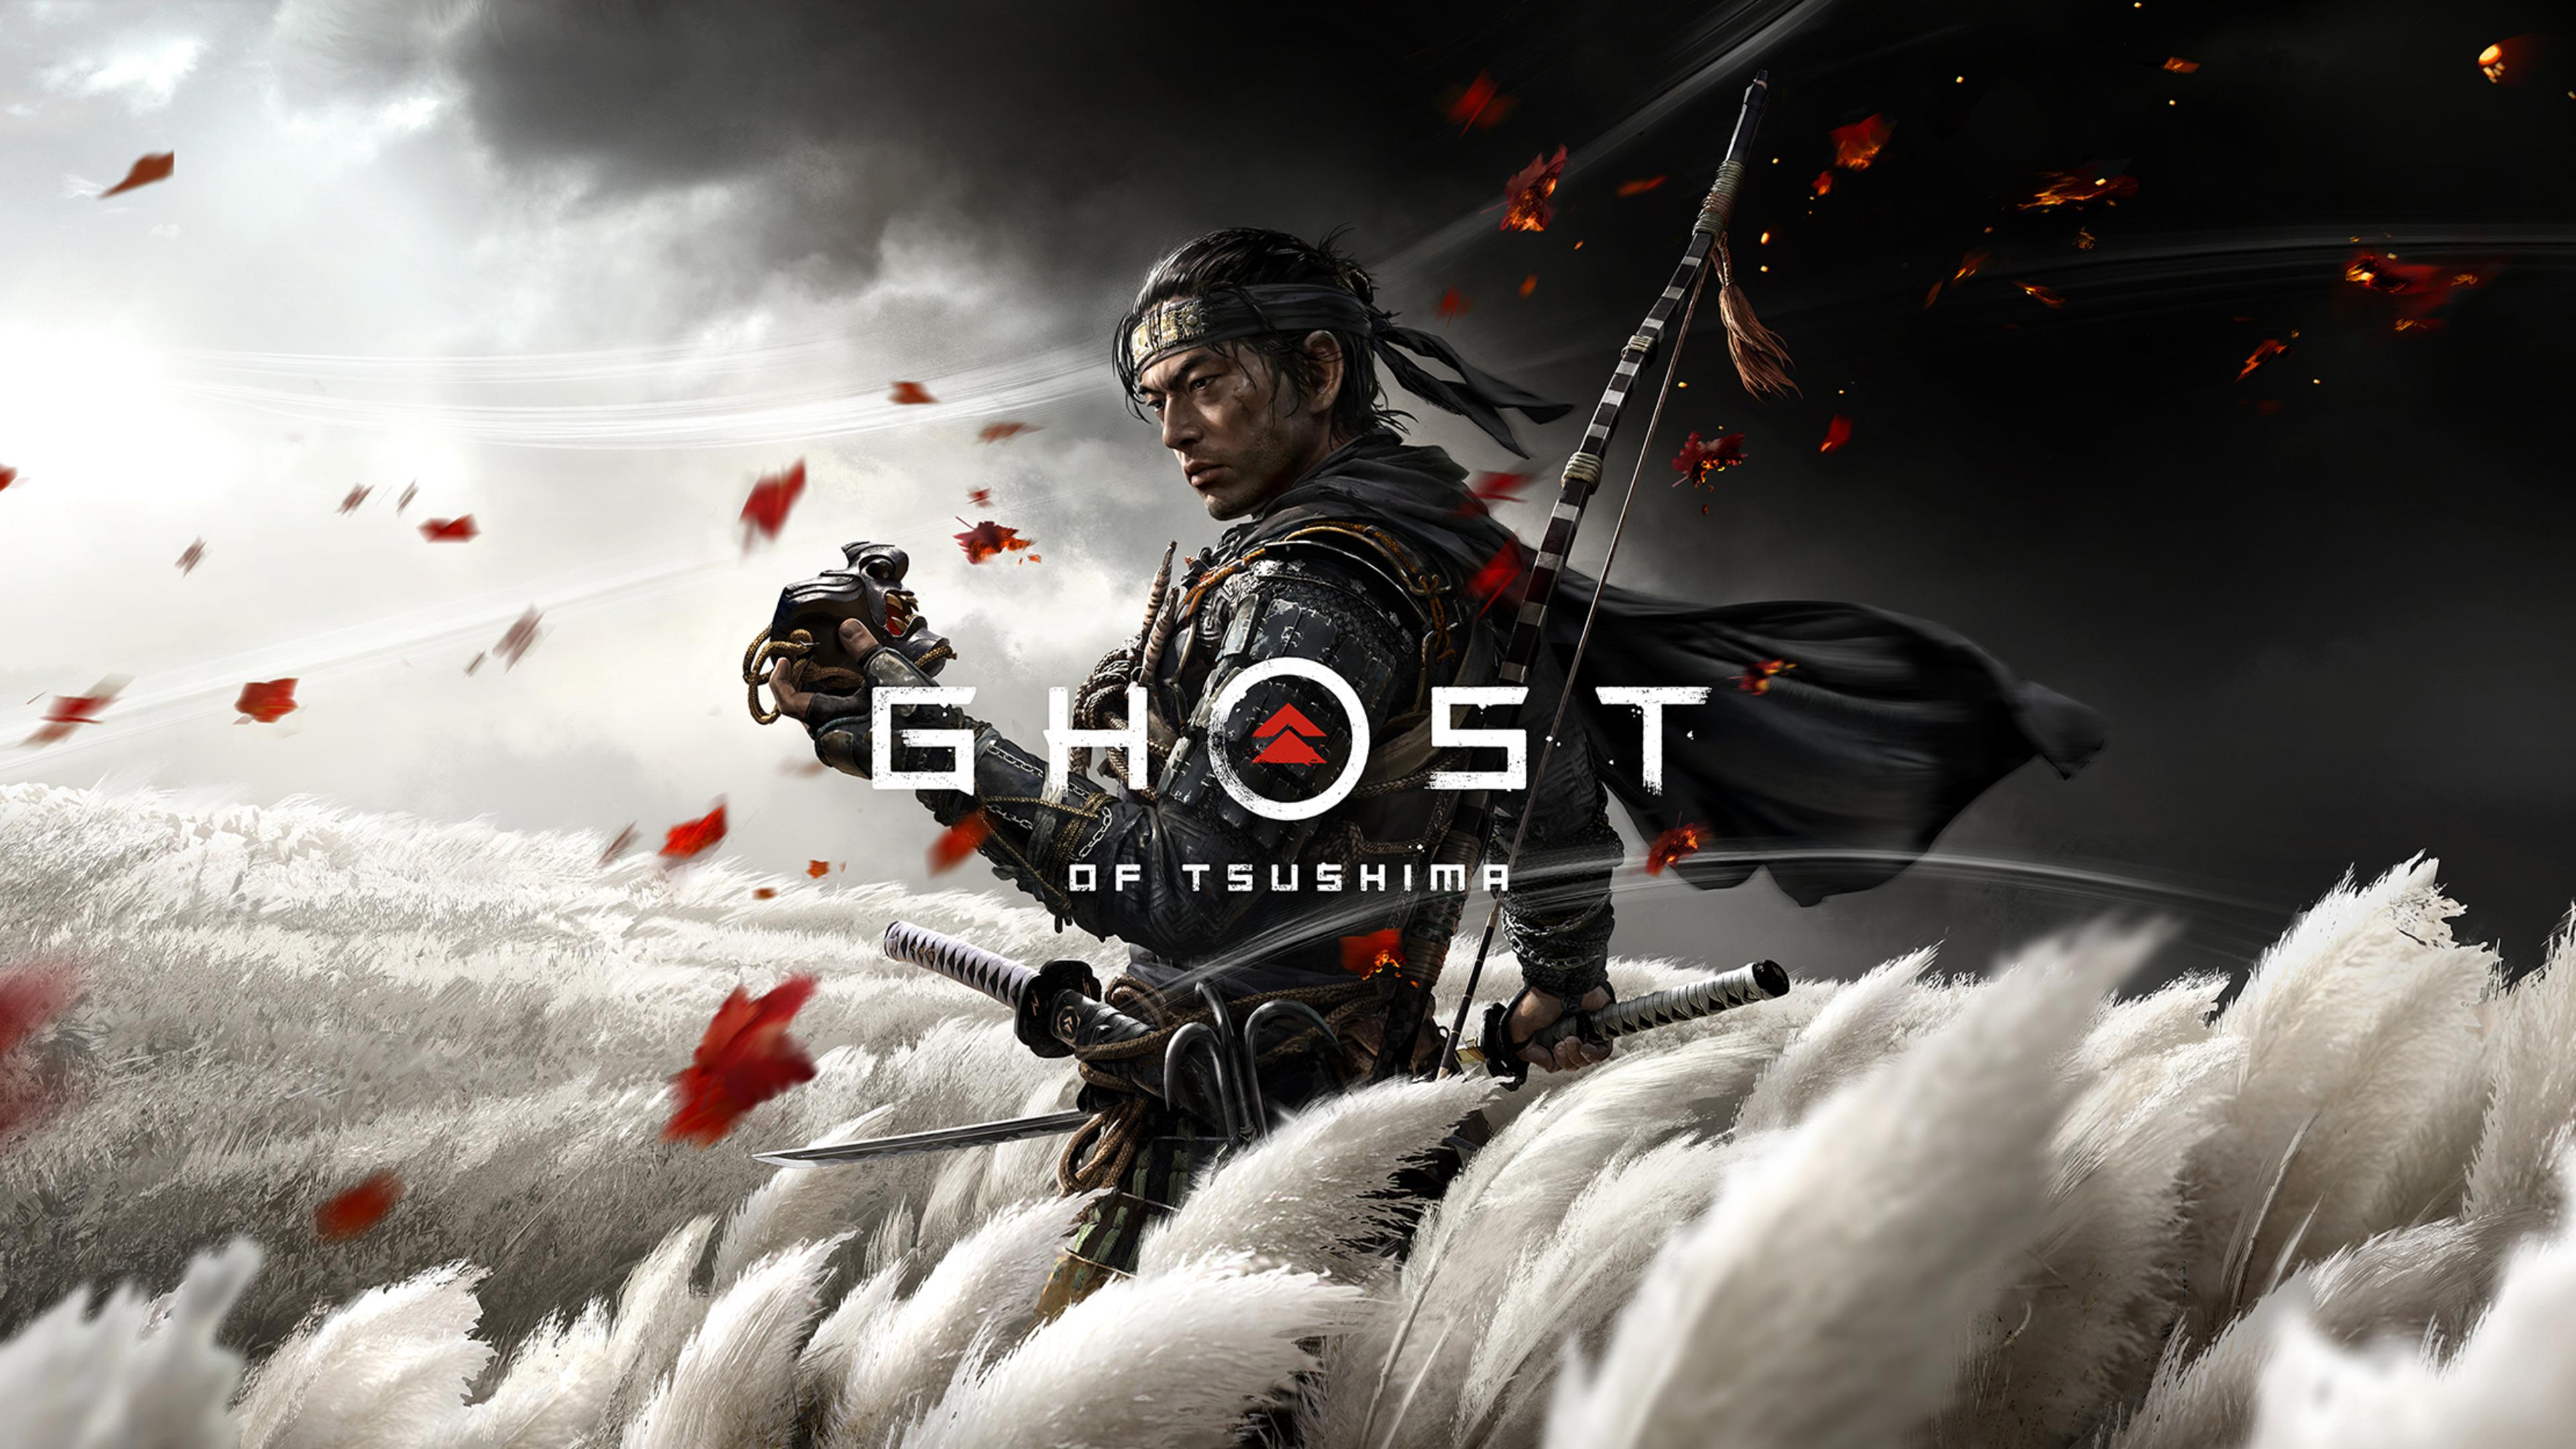 ghost-of-tsushima-ce.jpg